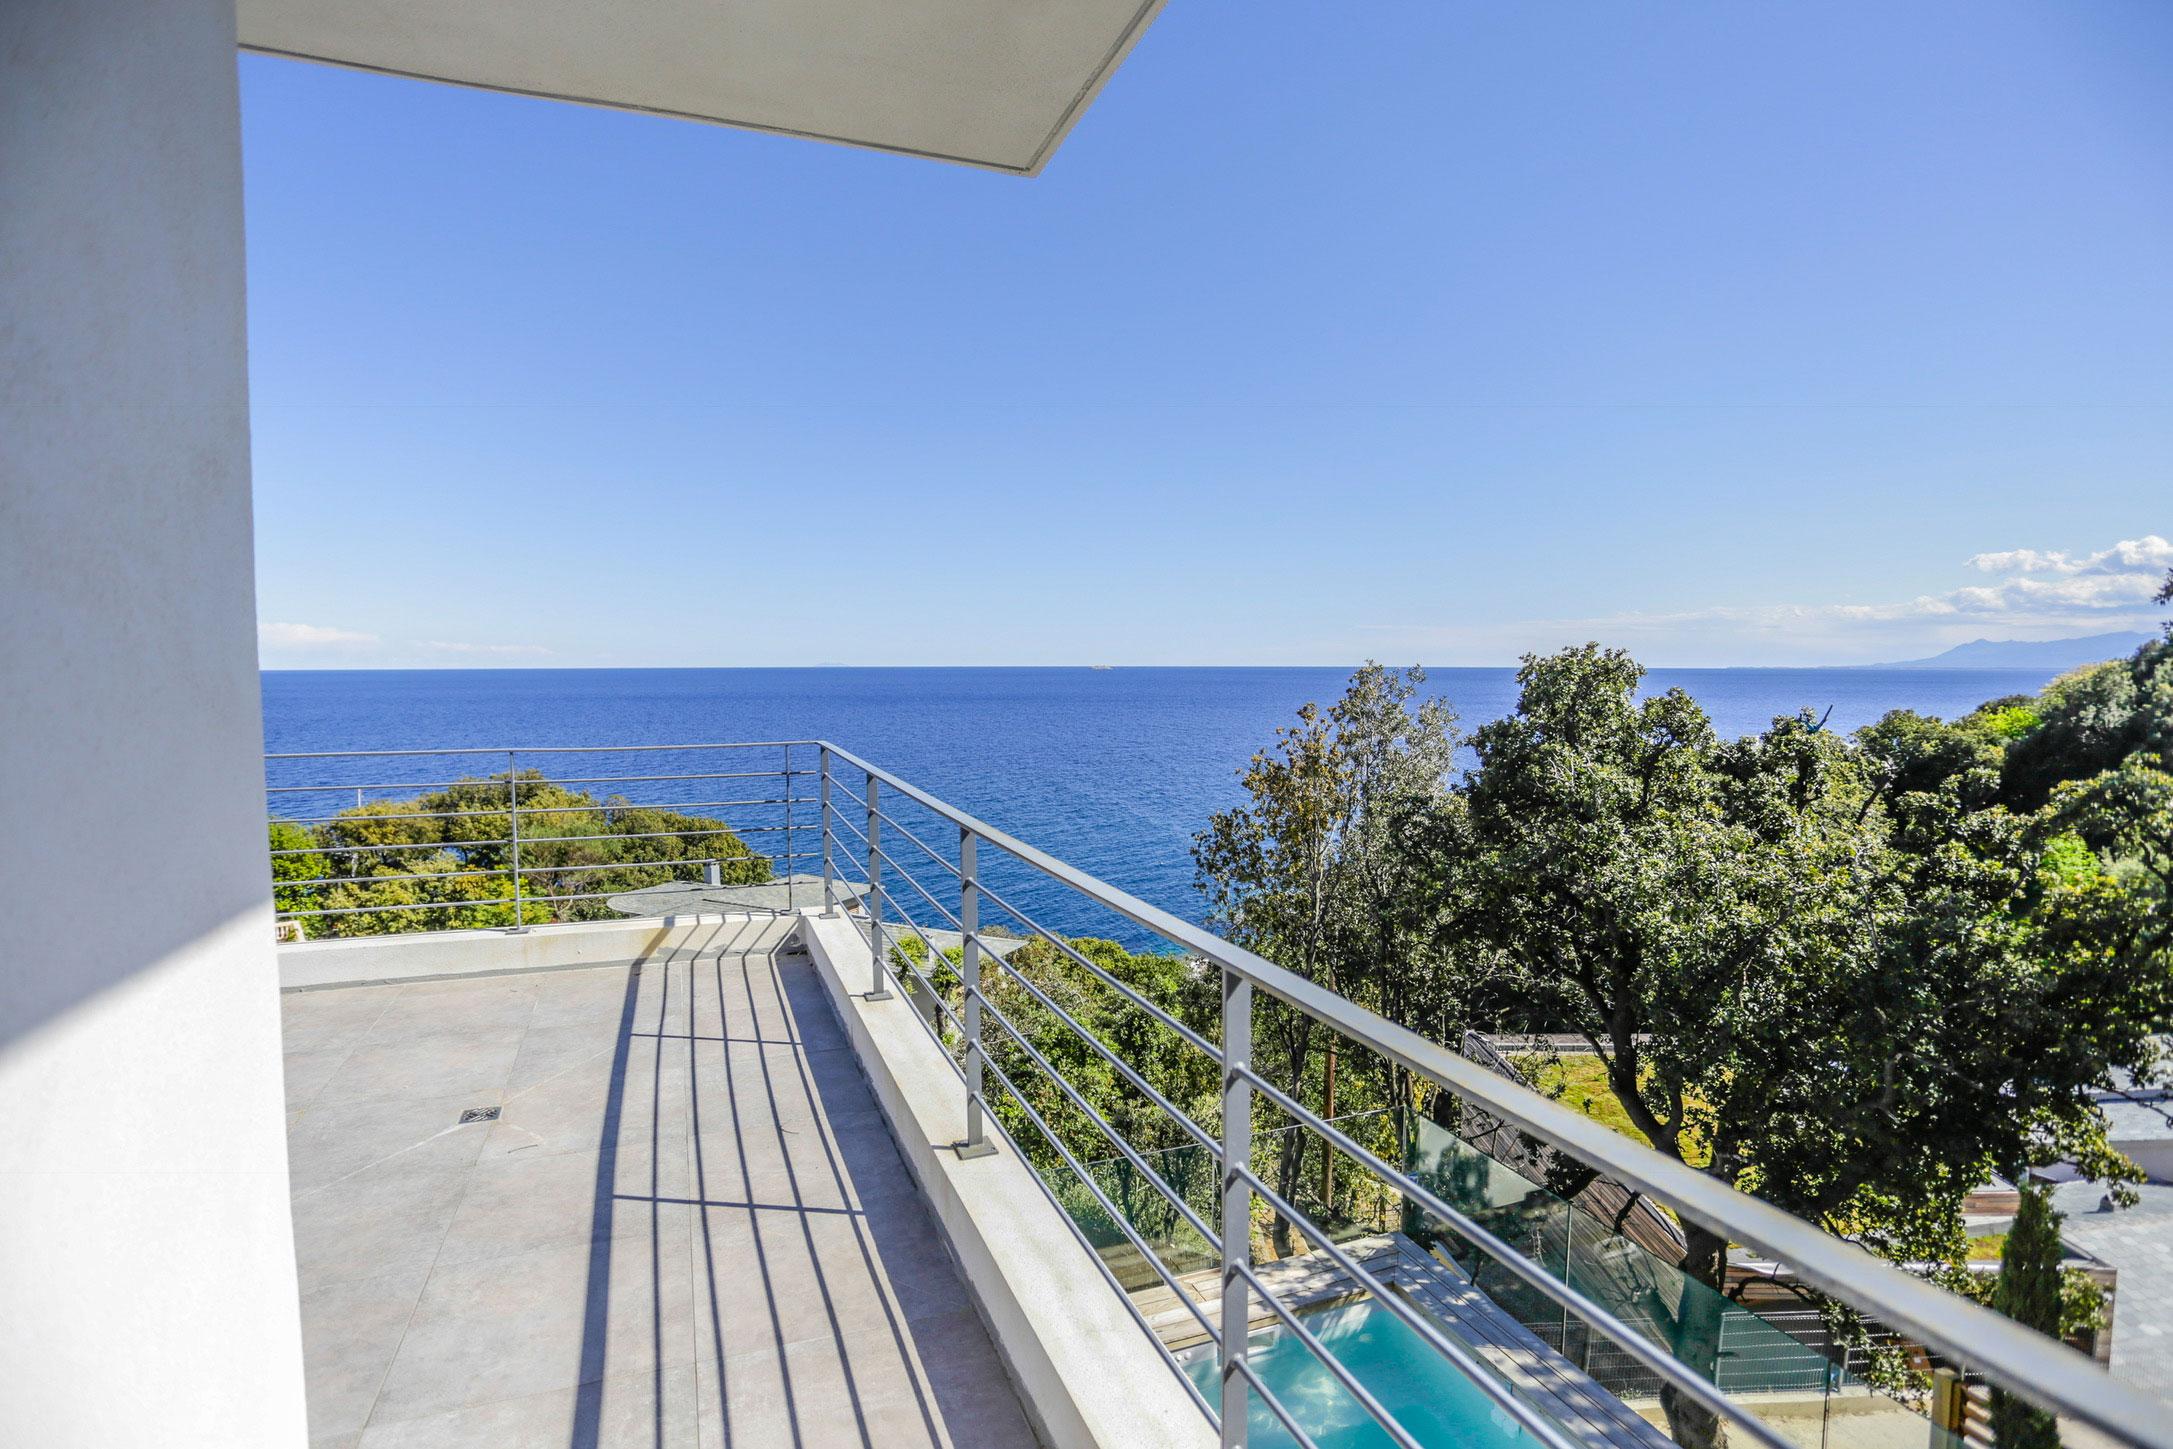 Location de vacances erbalunga cap corse magnifique for Villa avec piscine en corse